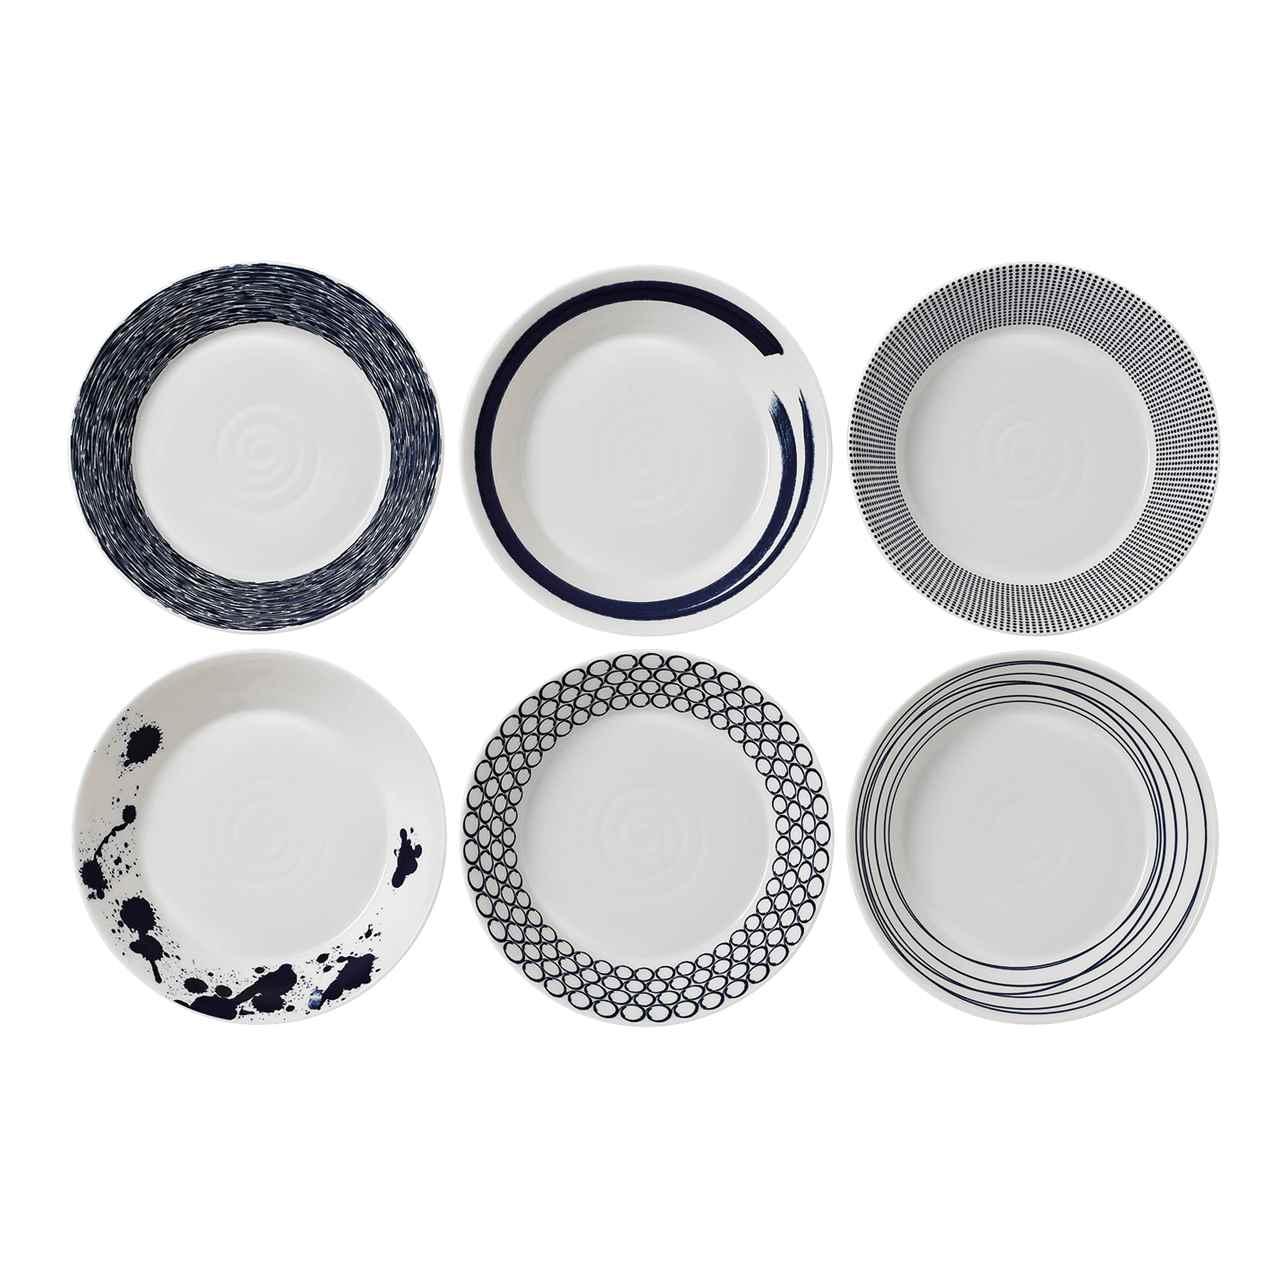 Pacific Blue Pasta Bowl (Set of 6)